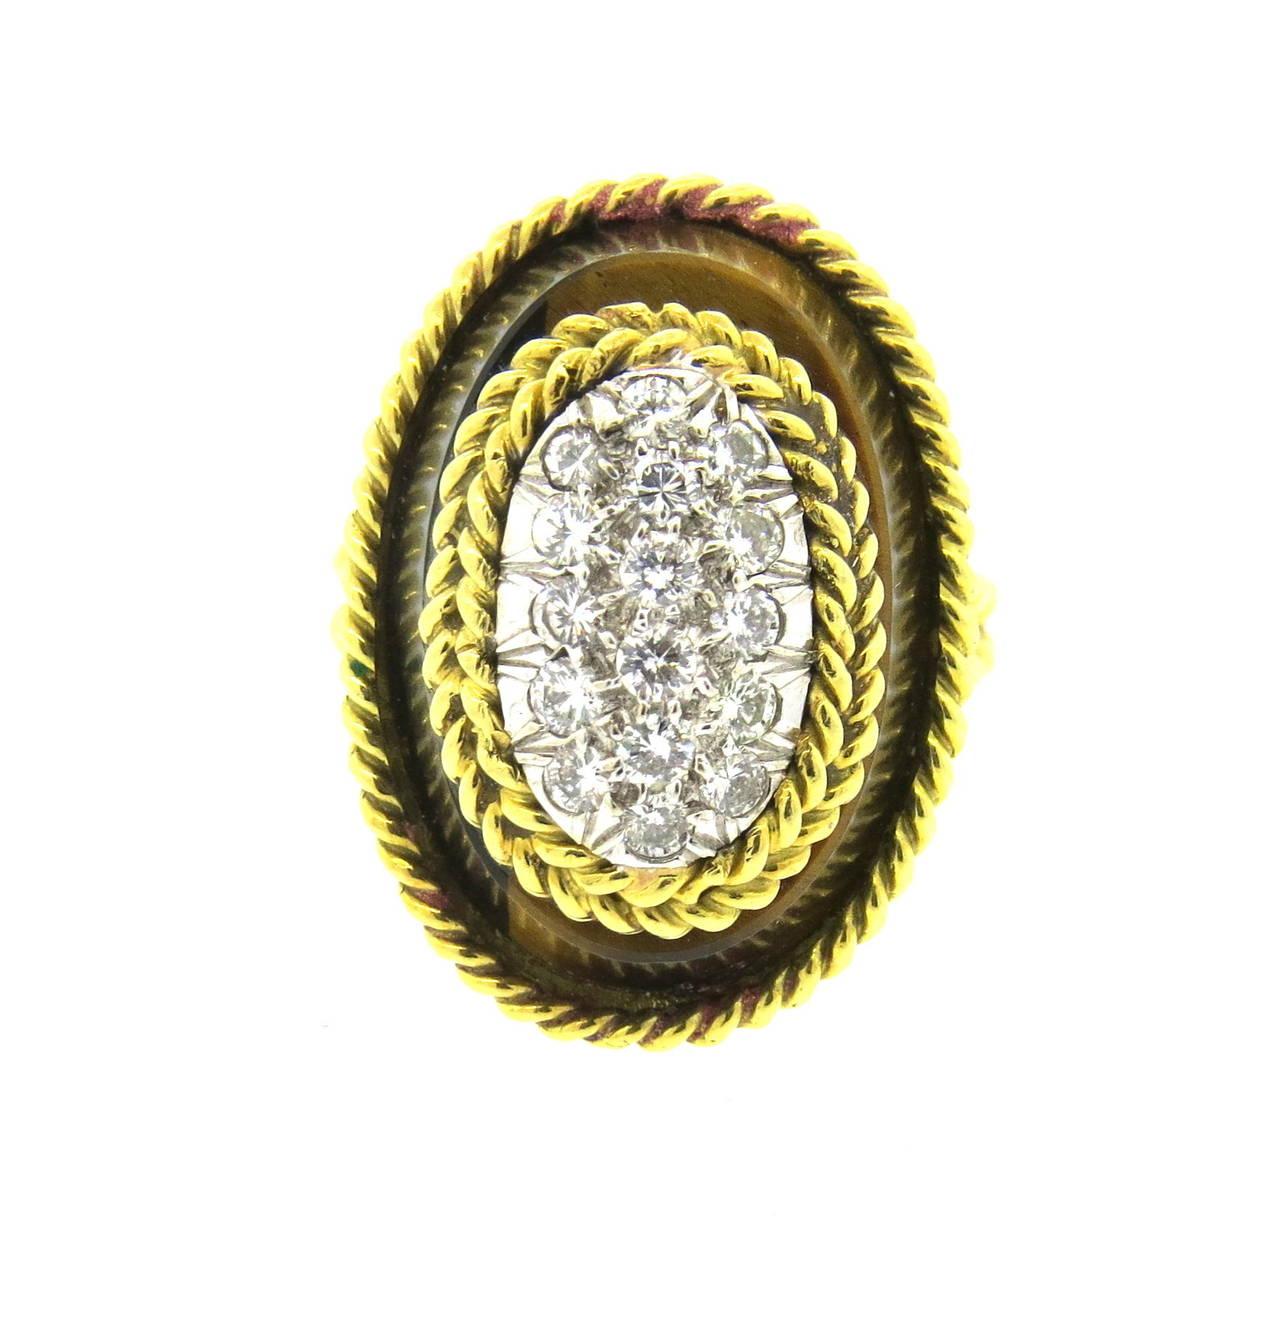 1970s tiger s eye gold ring at 1stdibs